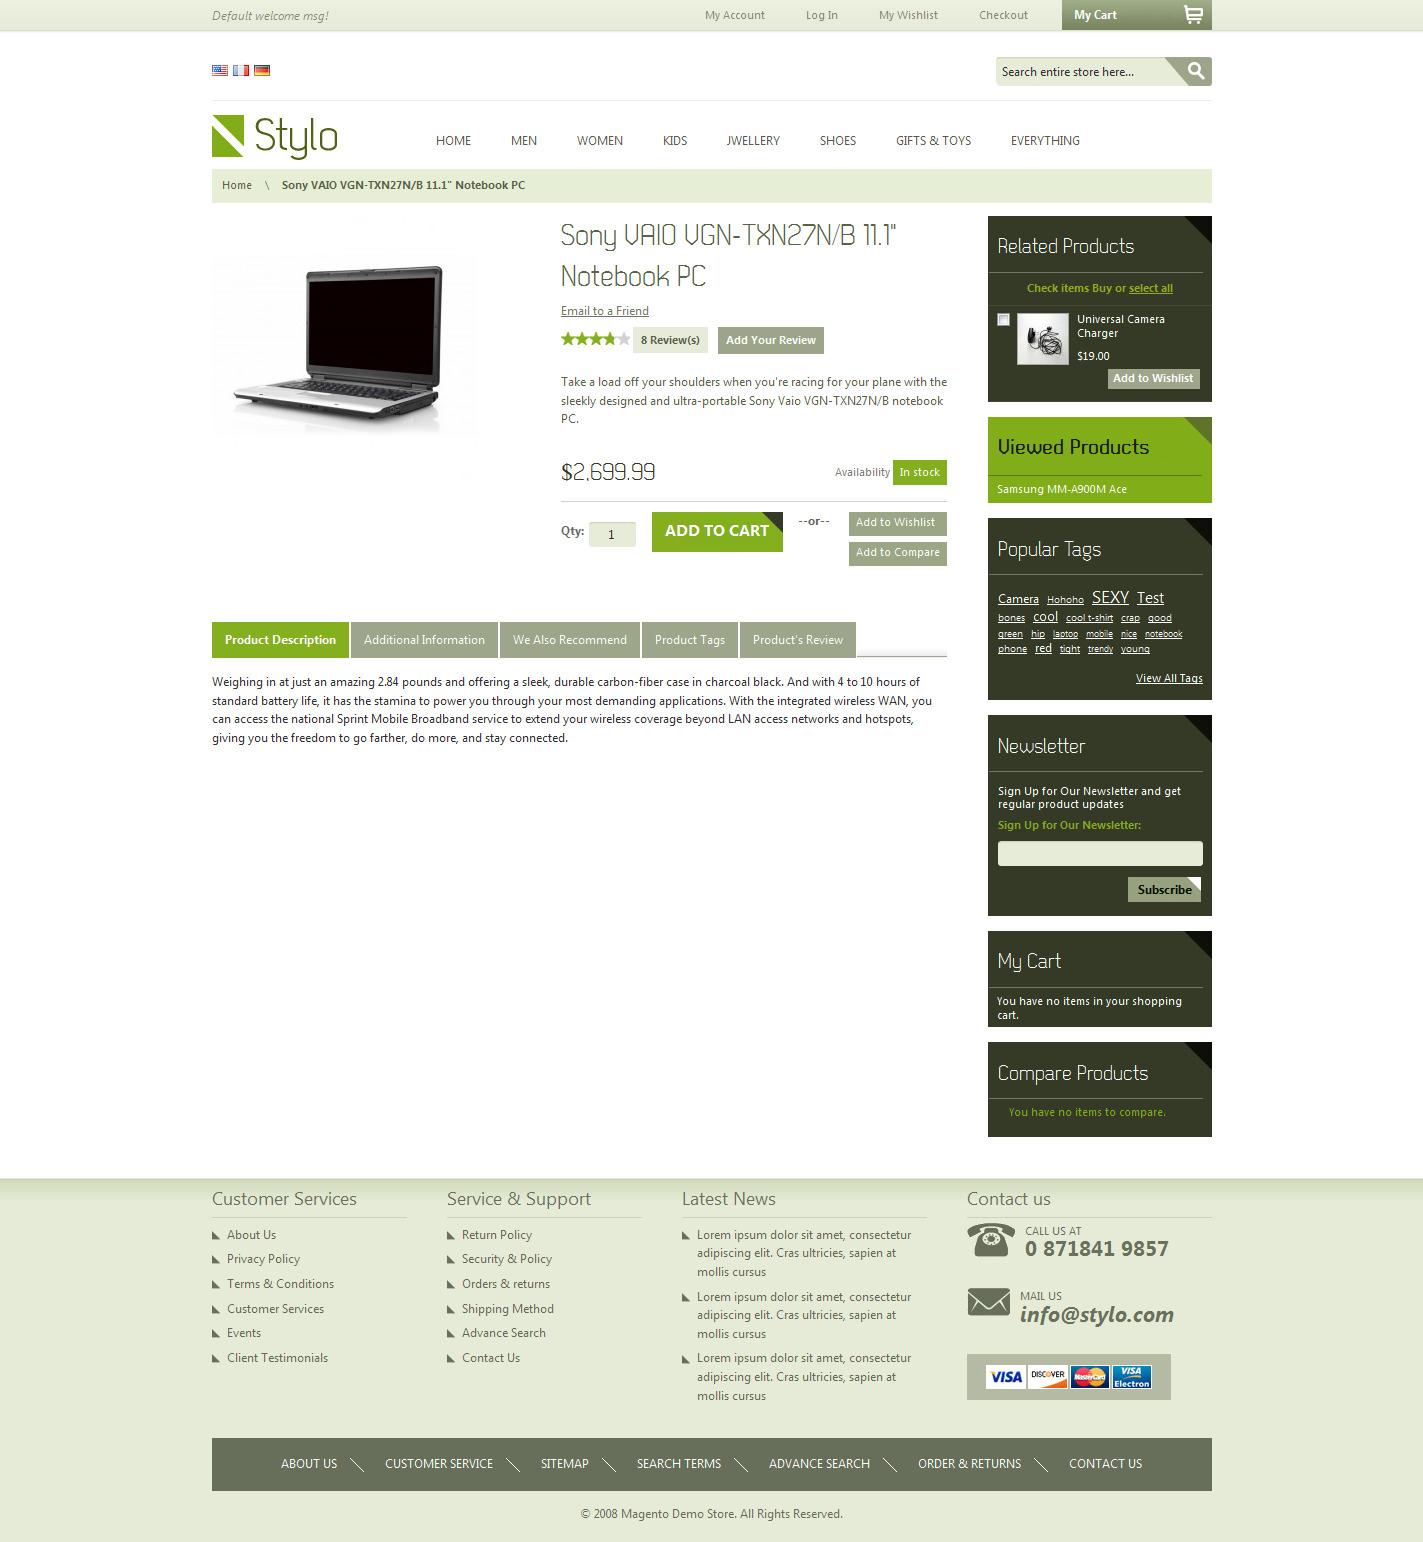 Stylo-Magento-Premium-Stylish-Online-Store-Templates